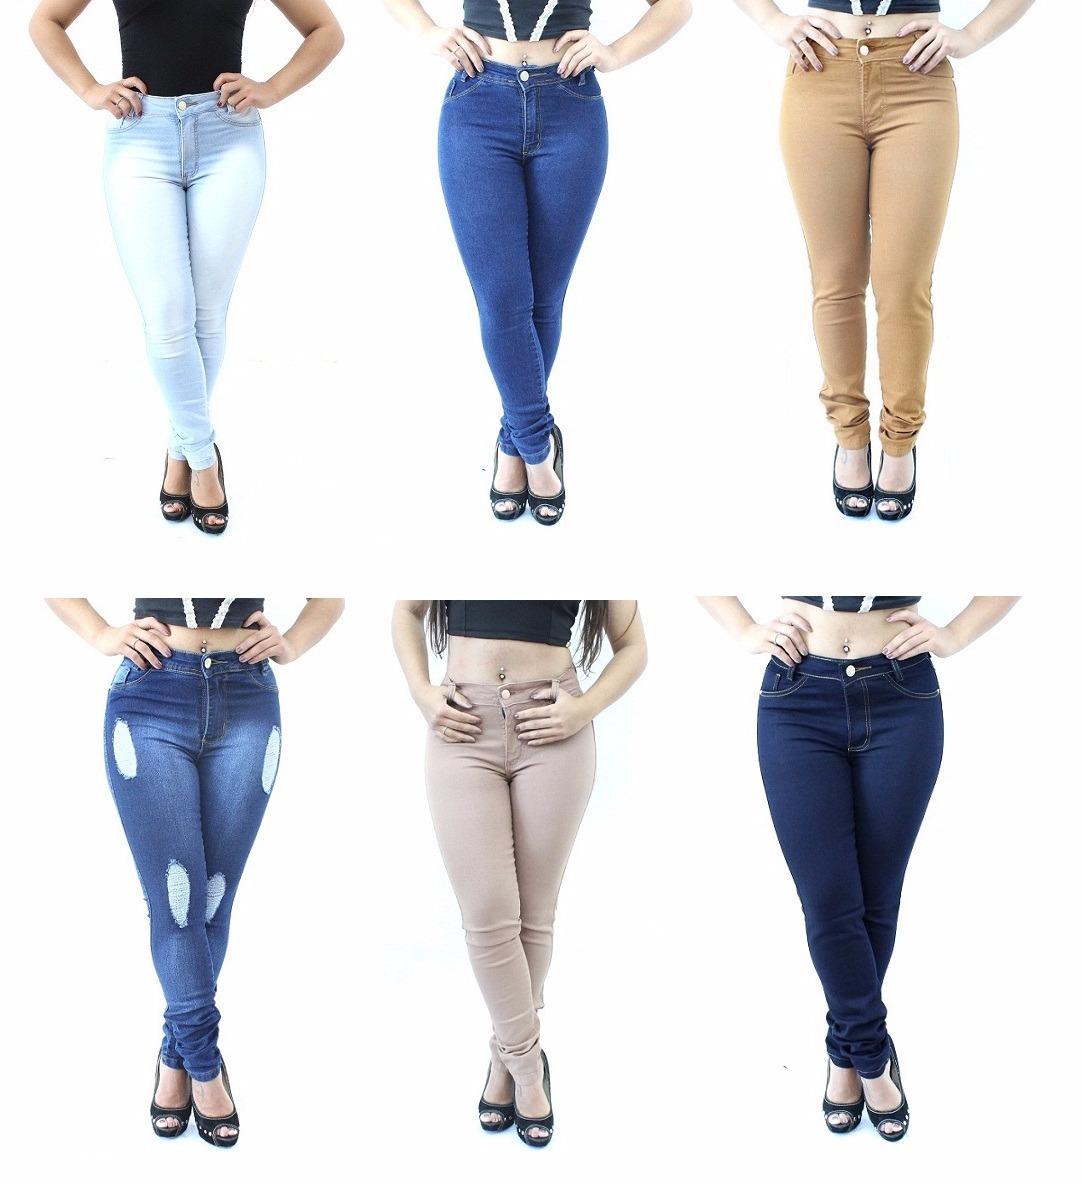 b47388960 kit 3 calça jeans cintura alta roupa feminina barata + lycra. Carregando  zoom.